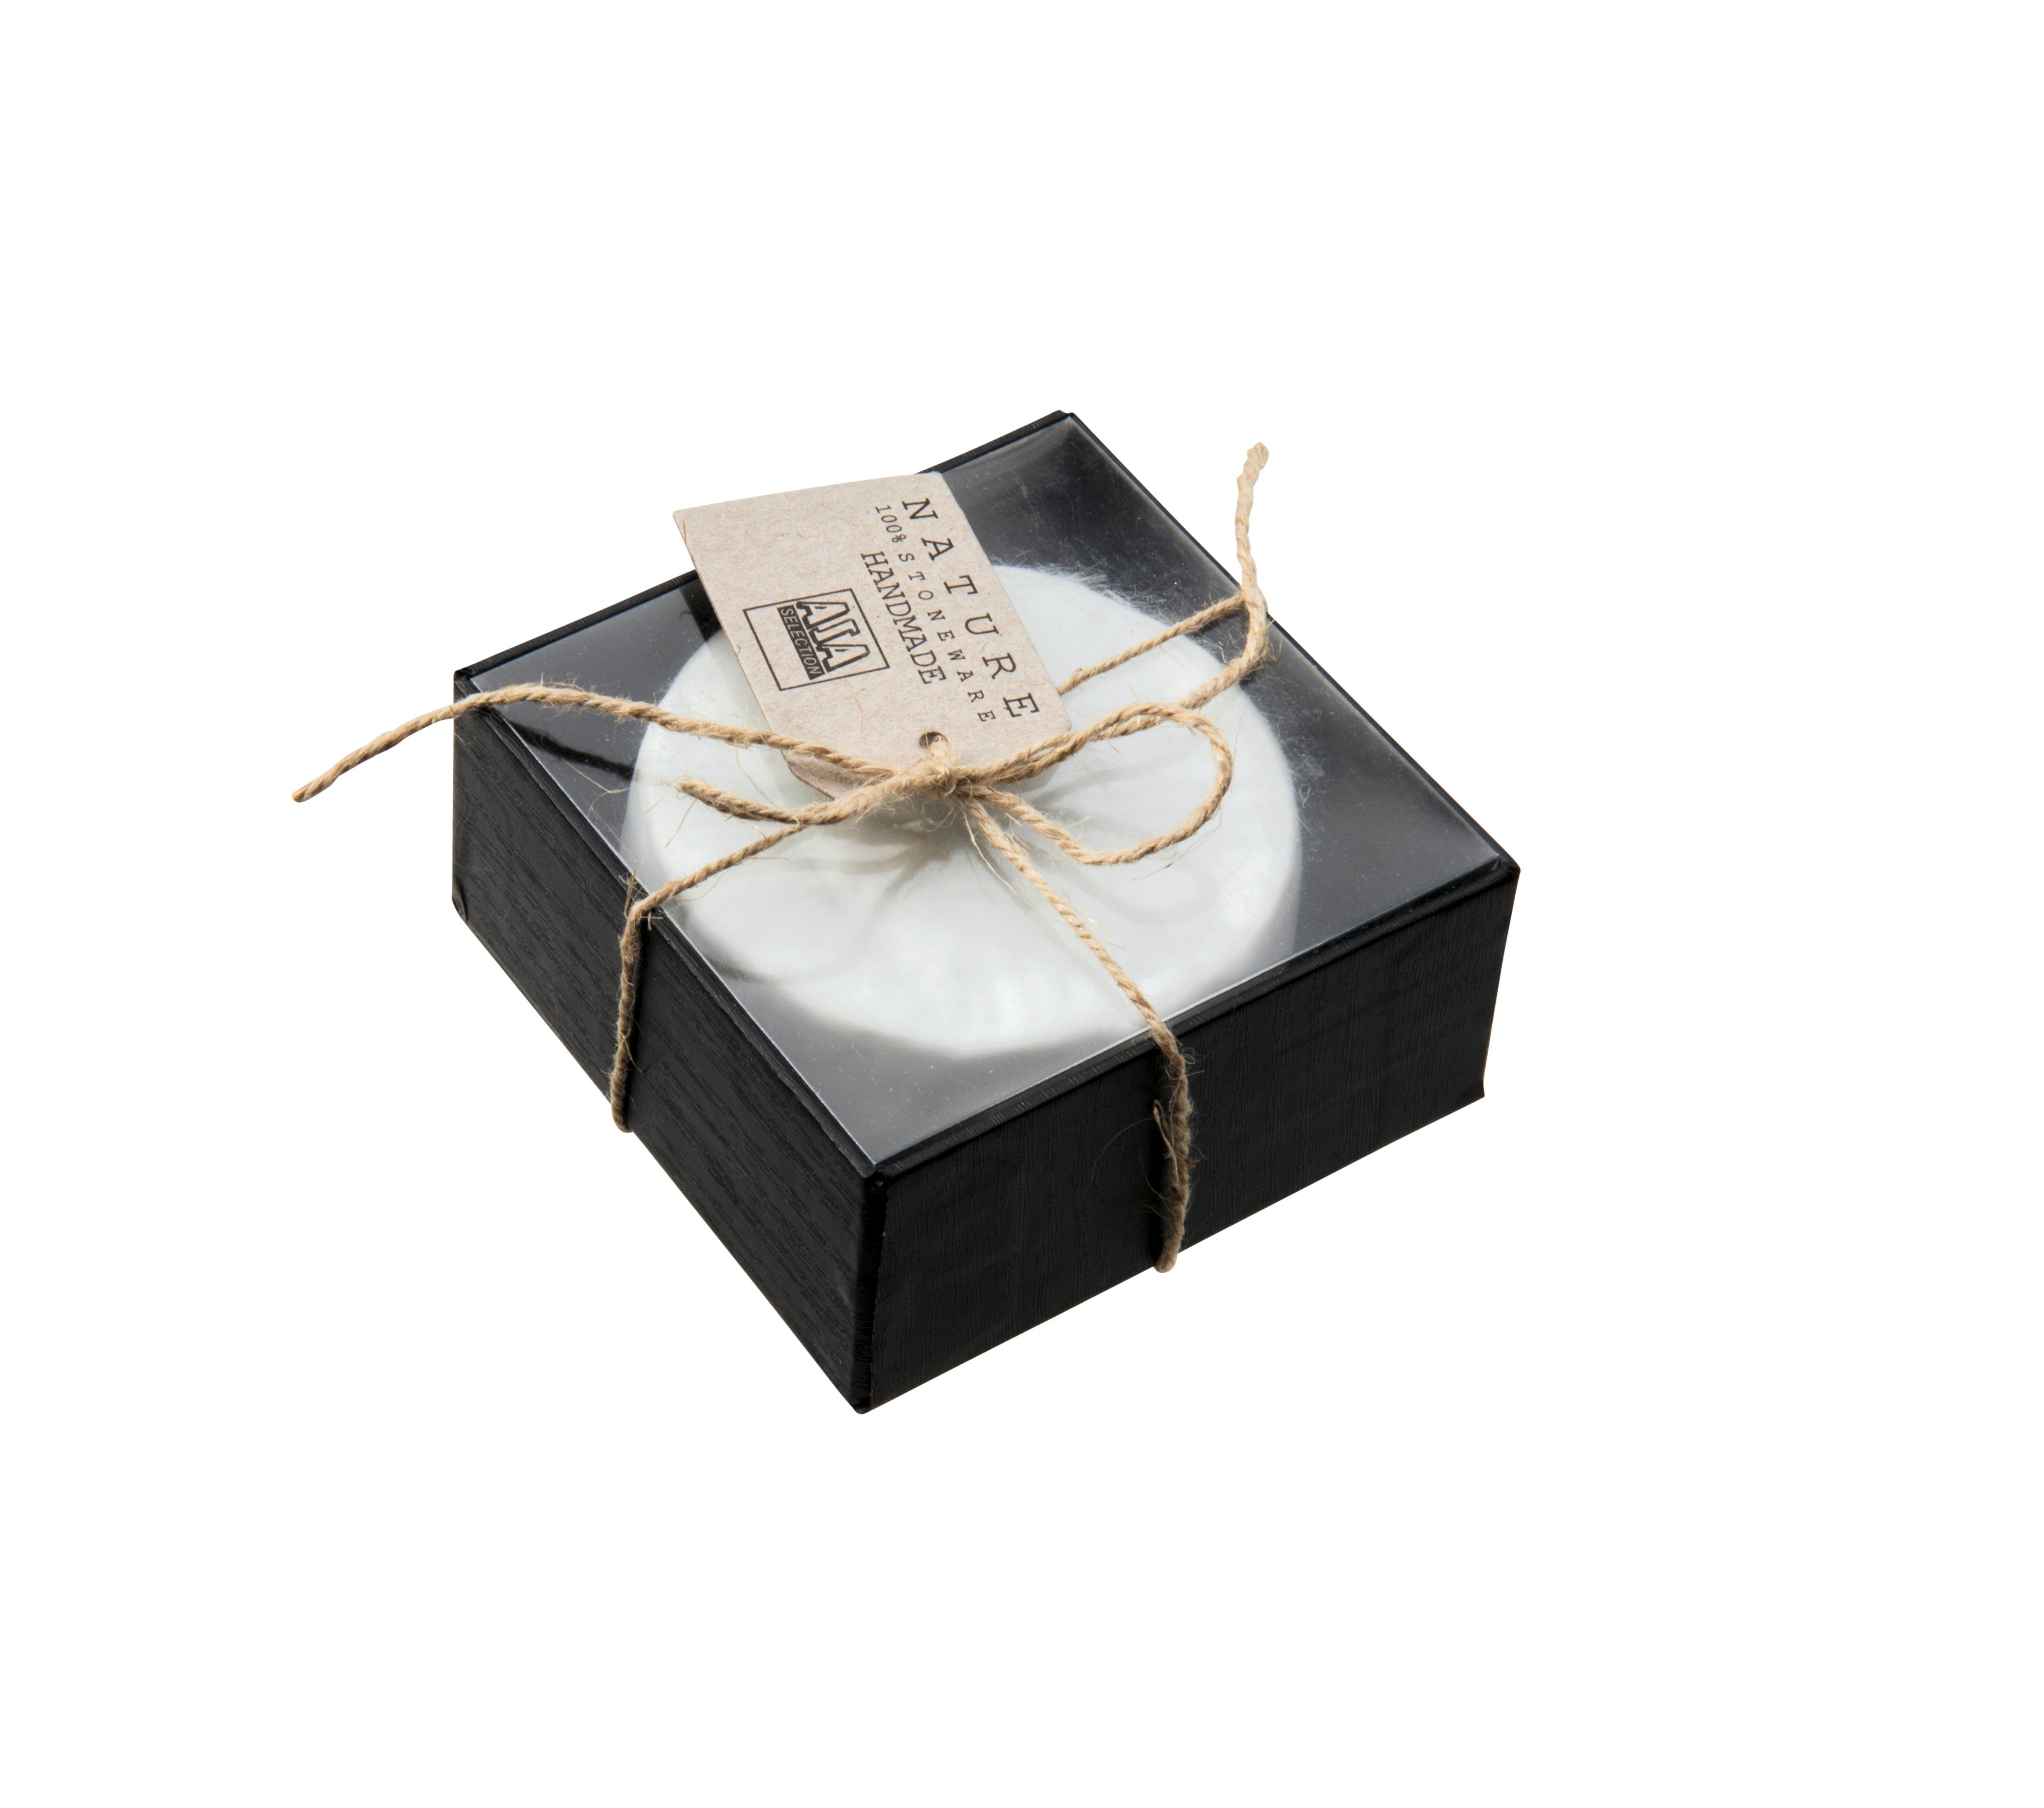 deko k se mini camembert wei home by asa die asa selection wohnwelten. Black Bedroom Furniture Sets. Home Design Ideas